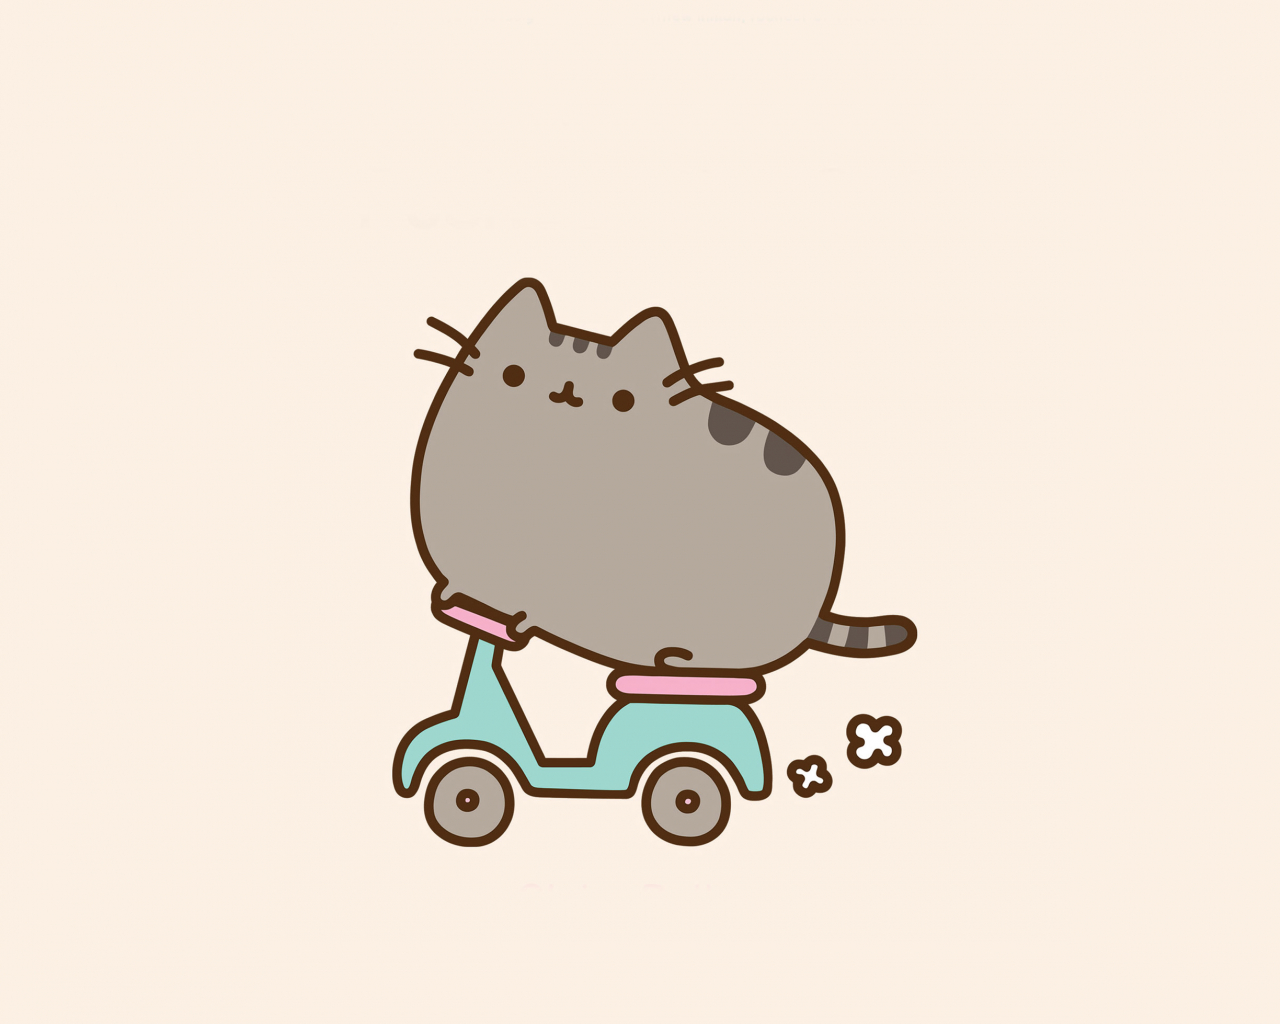 Free download Pusheen The Cat Wallpaper ...